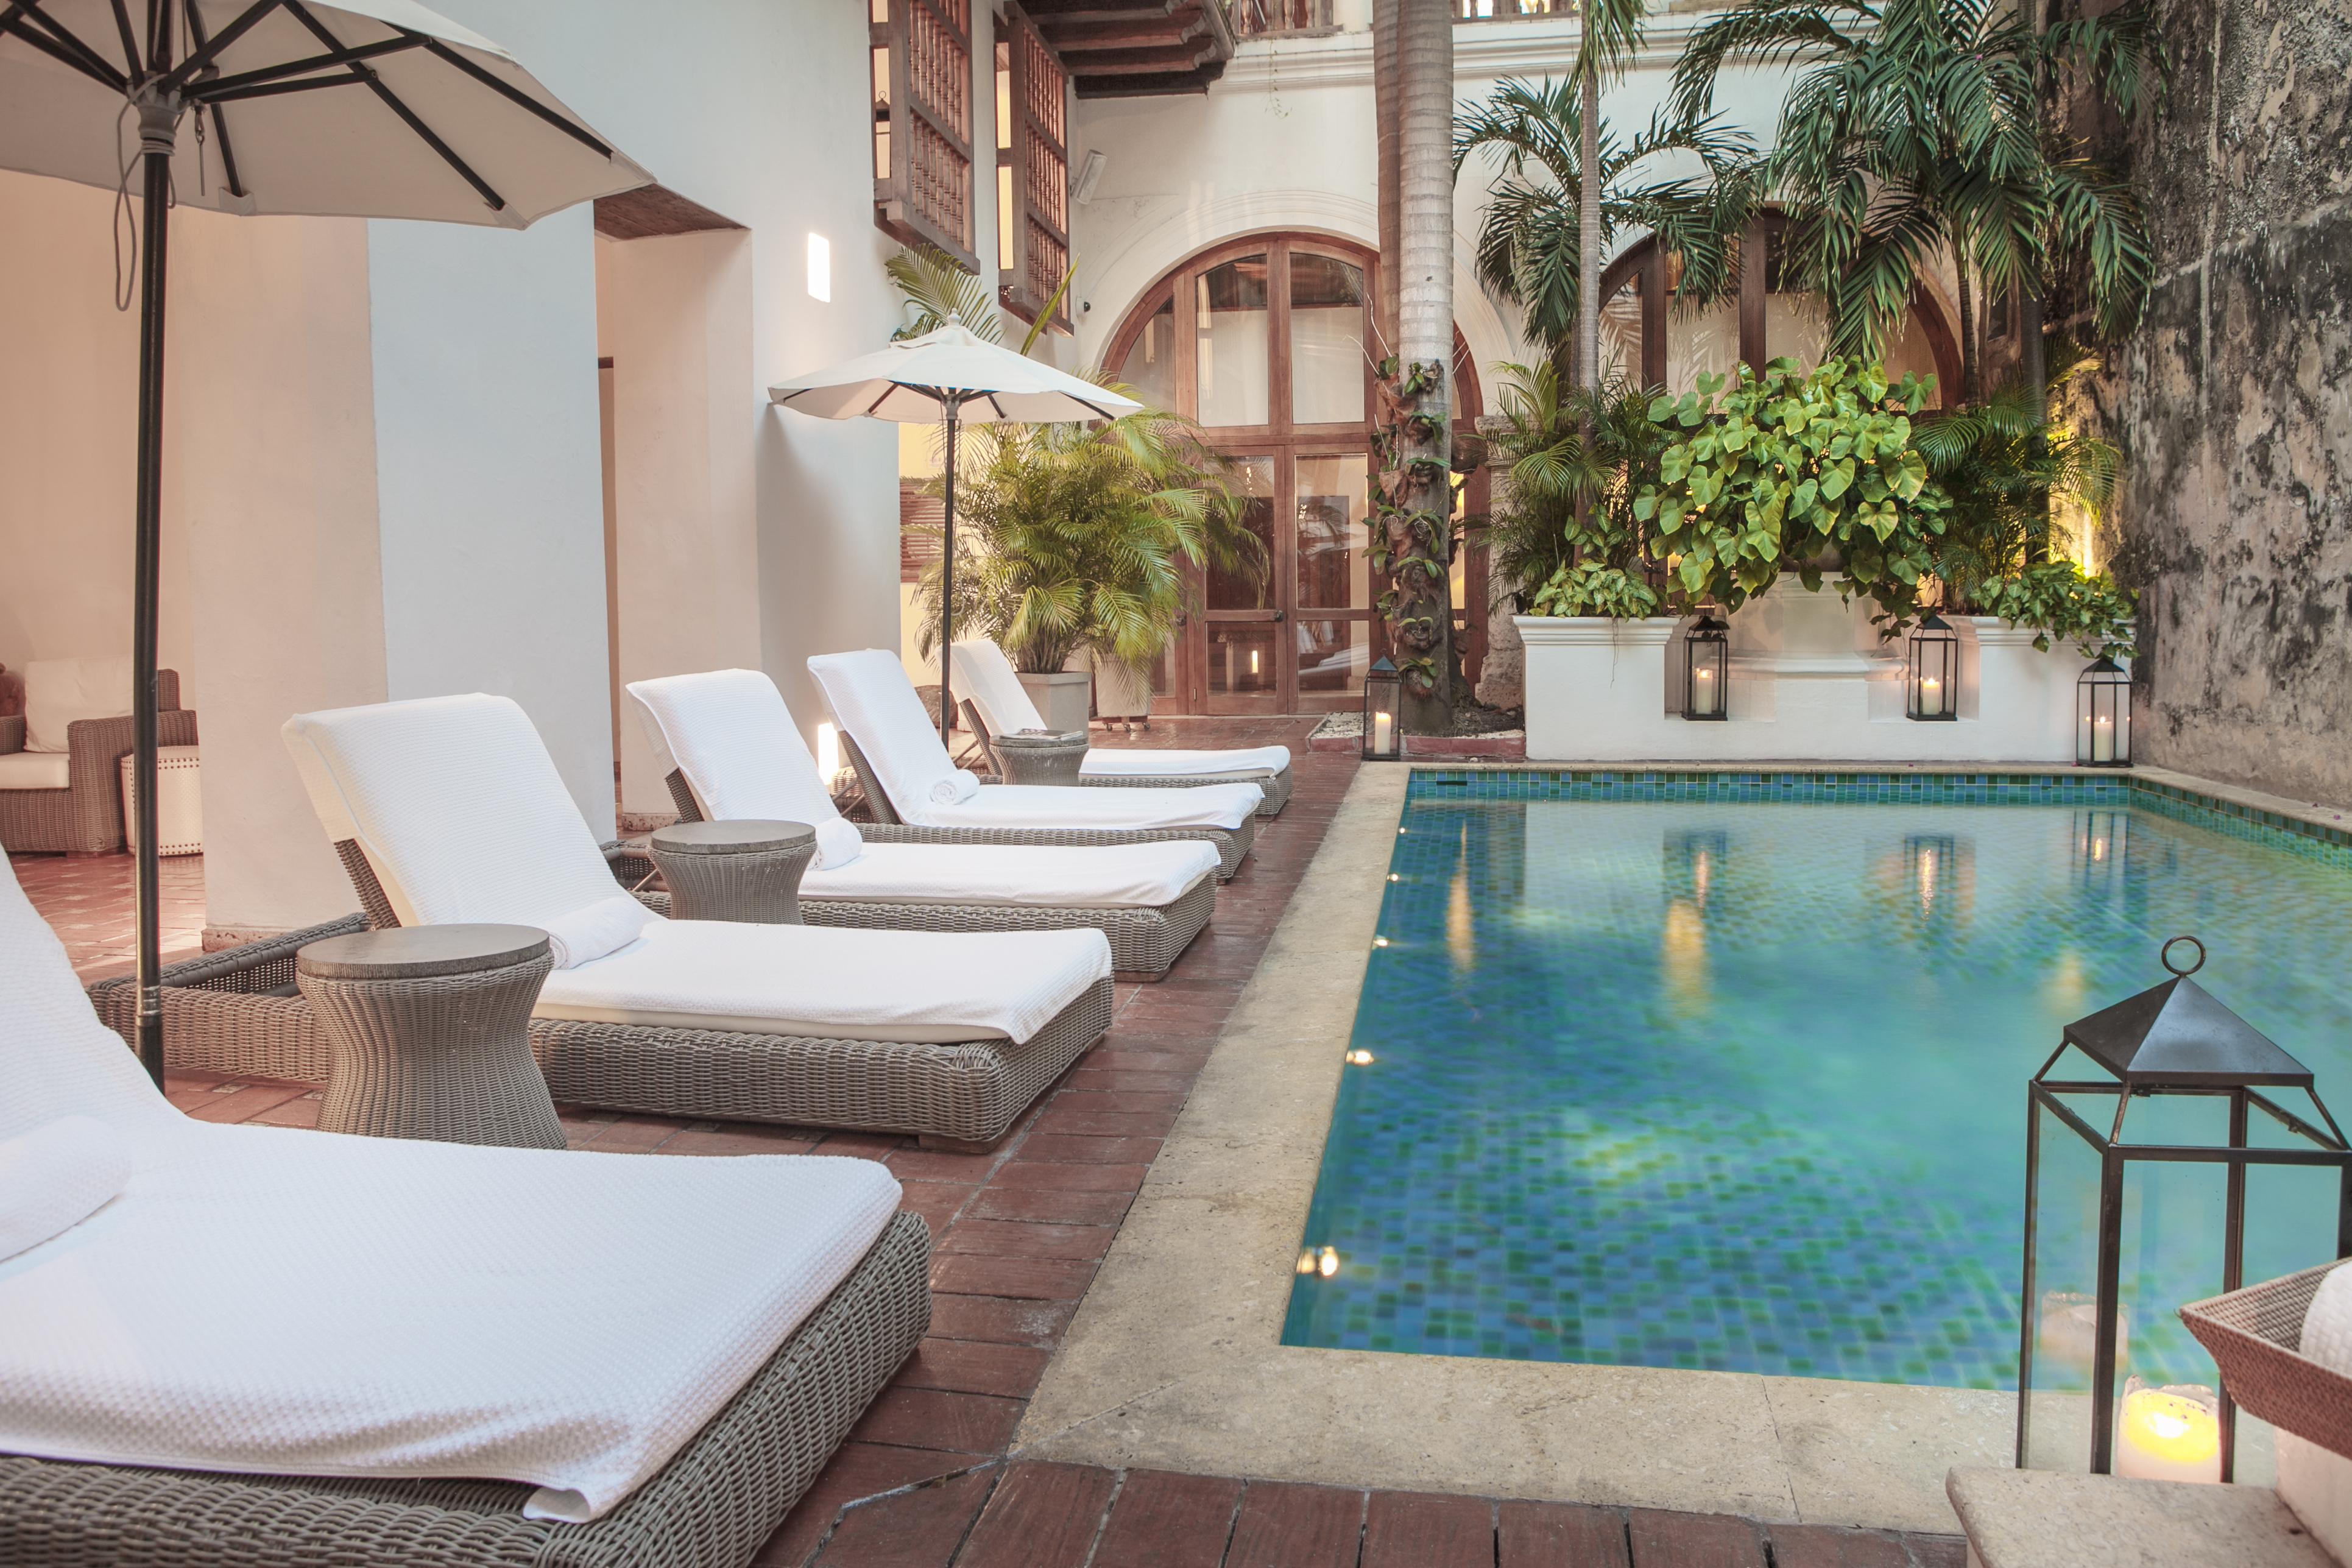 casa-san-agustin-pool